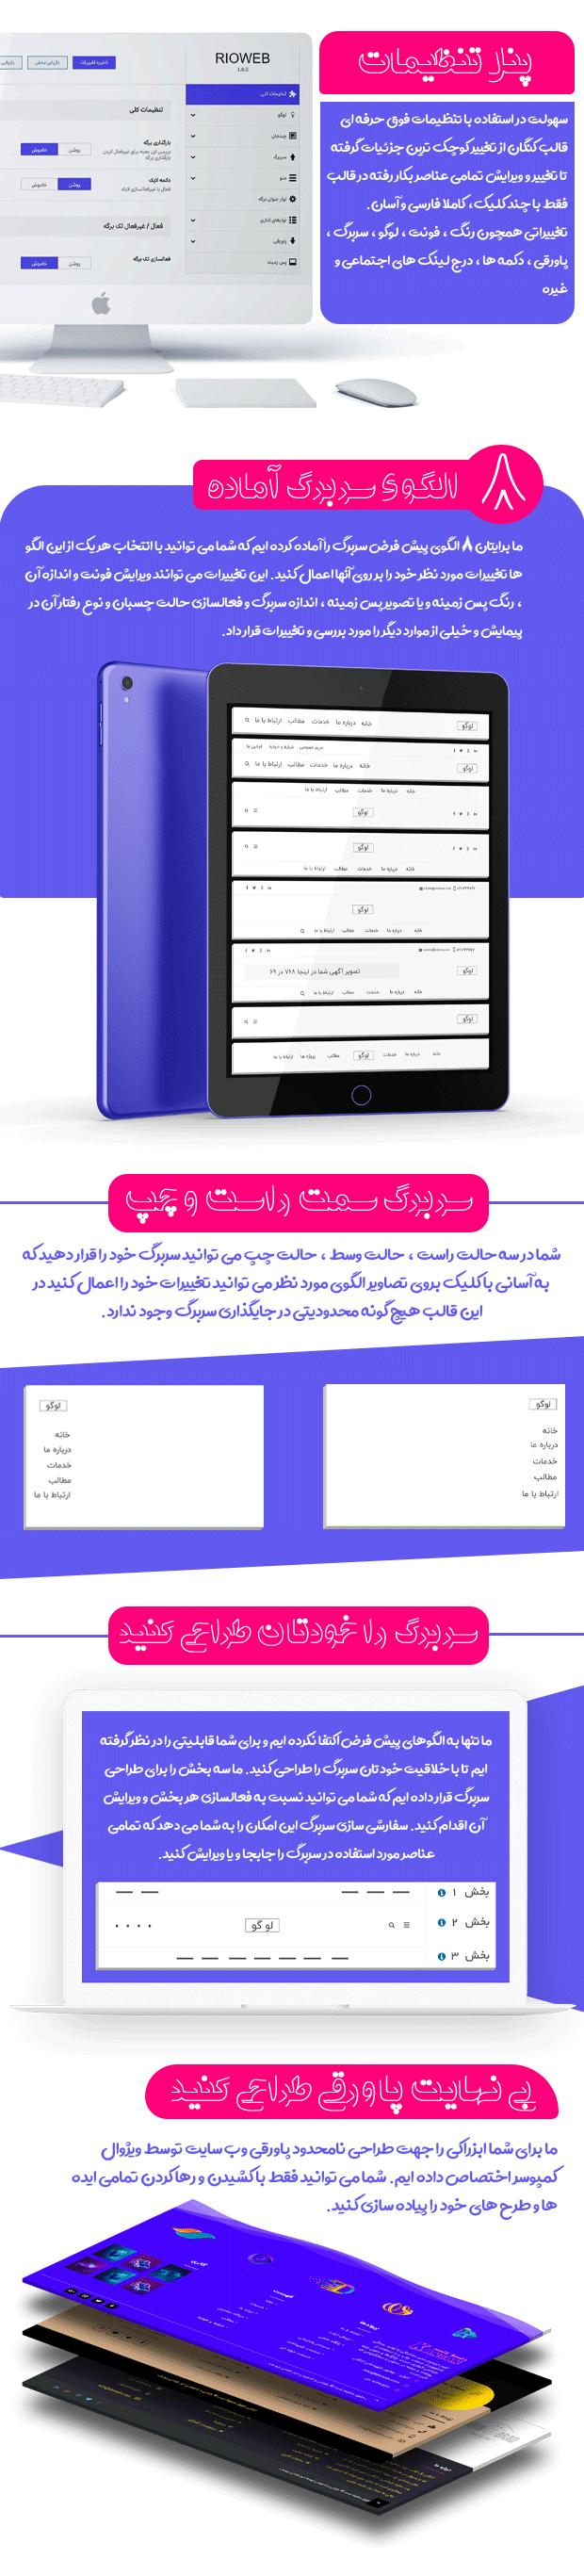 پنل تنظیمات قالب چند منظوره کنگان، پوسته وردپرس ایرانی Kangan